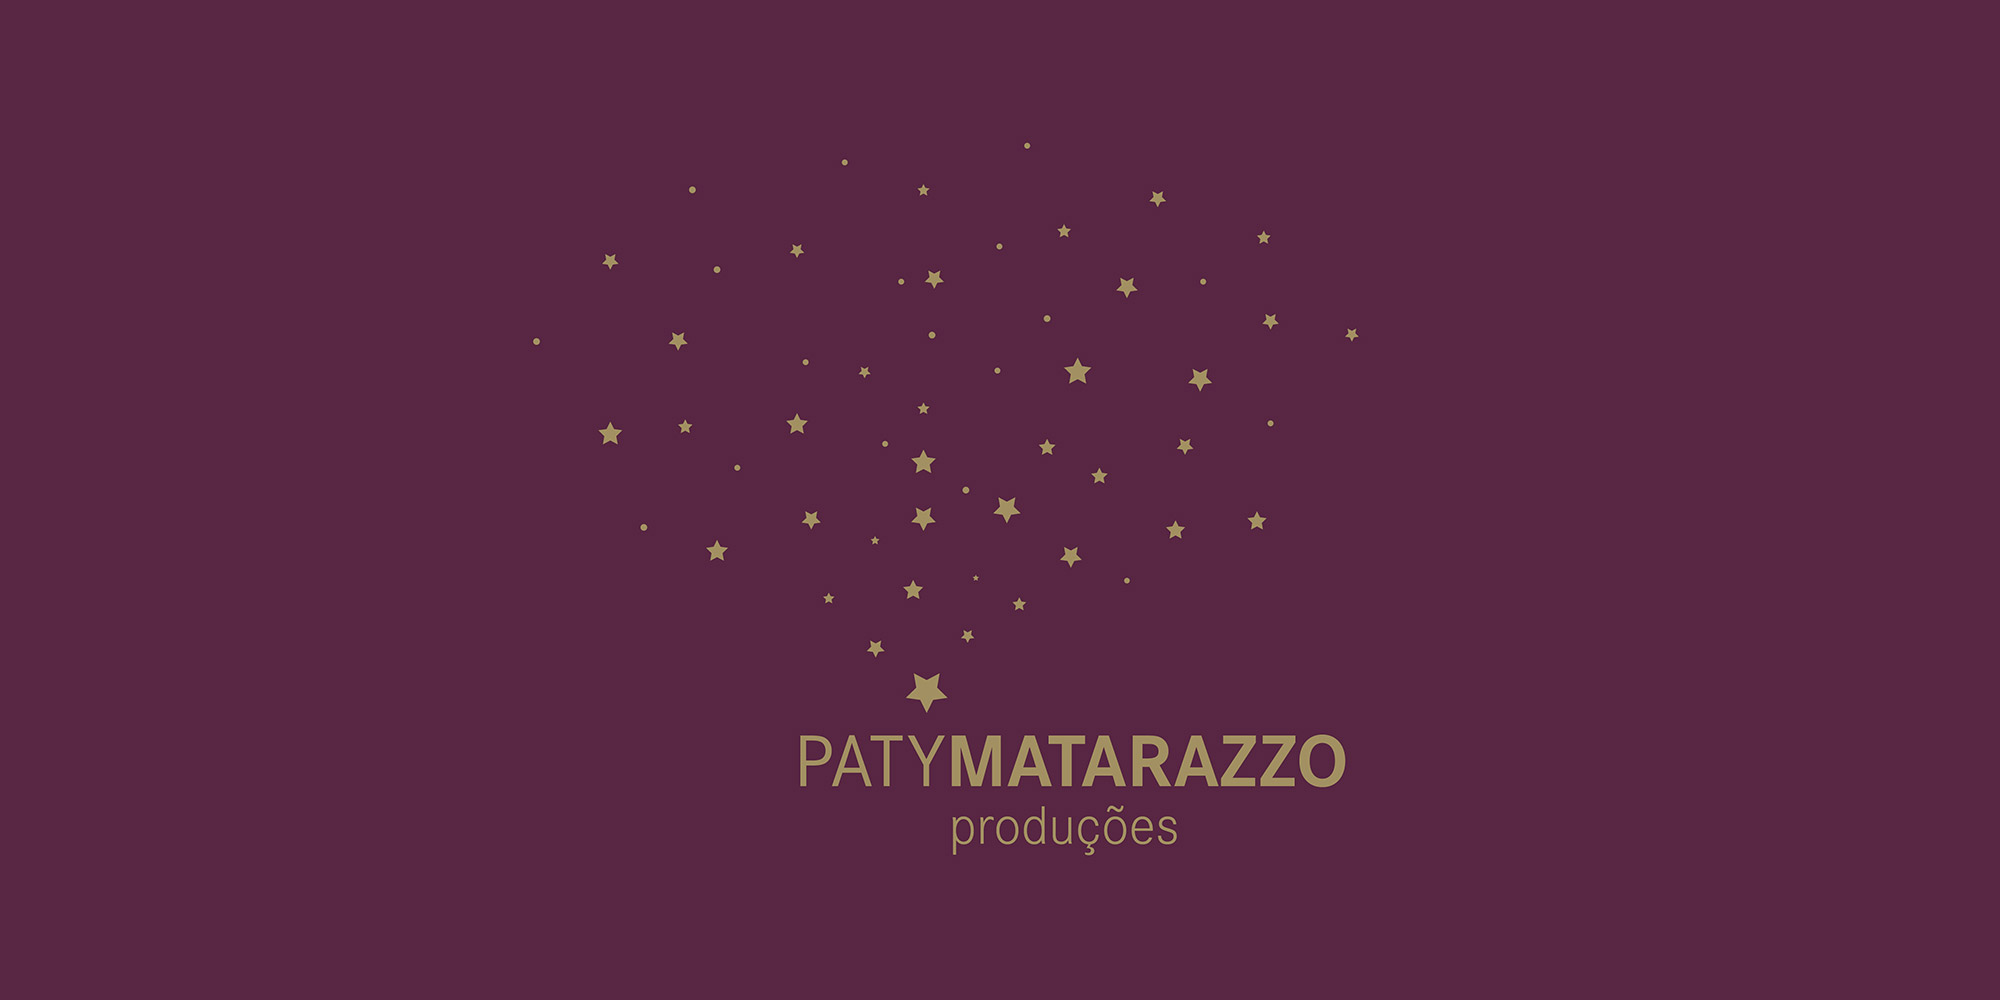 Paty Matarazzo Produções